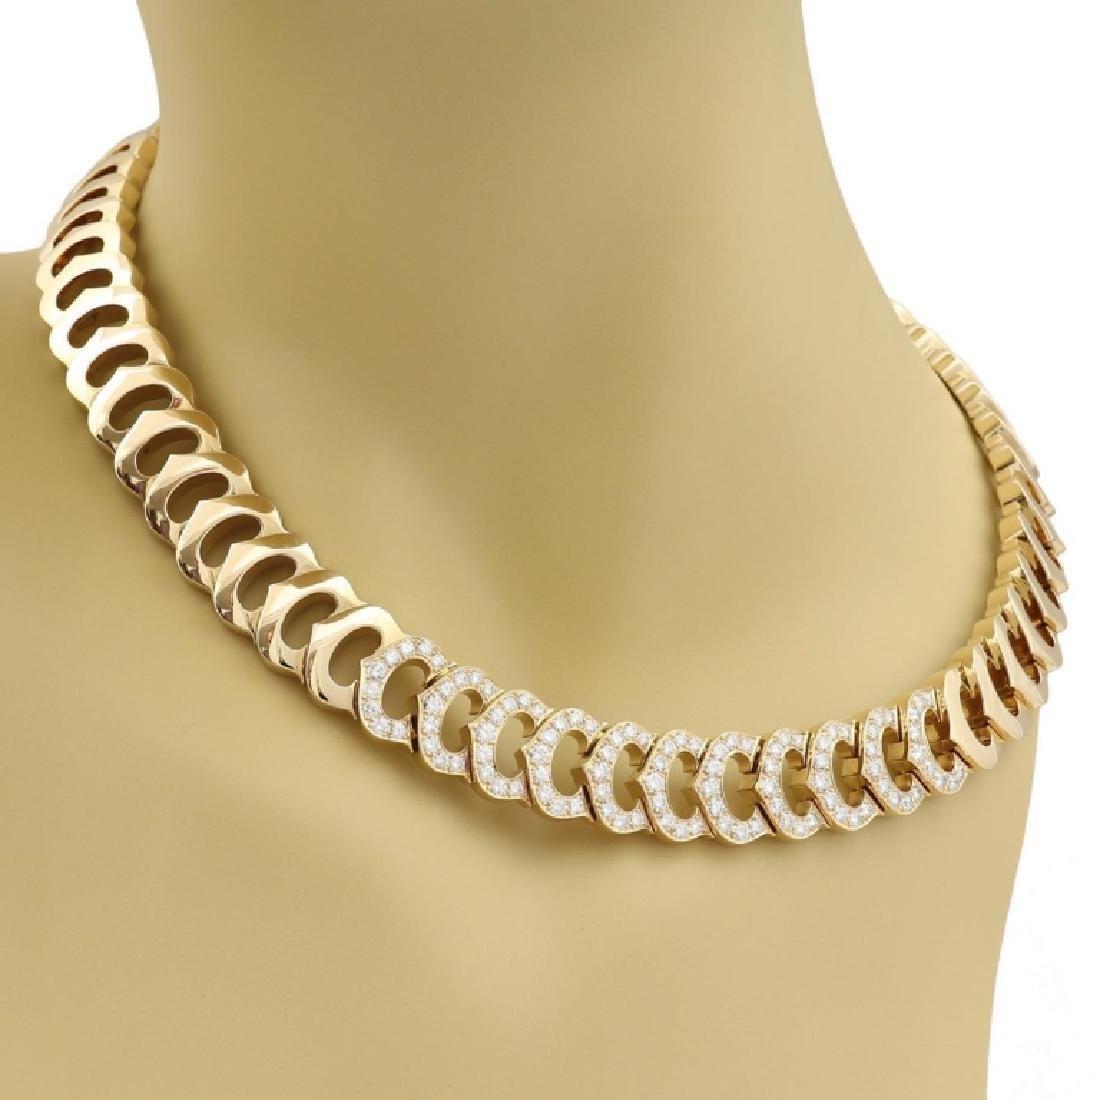 Cartier C Logo 2.75ct Diamond 18k Gold Necklace - 4